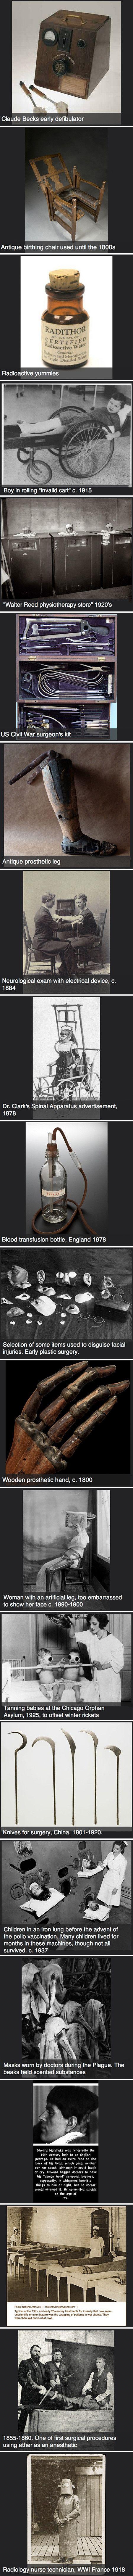 Best Creepy And Disturbing Images On Pinterest Another World - 22 weirdest deaths ever morbid fascinating